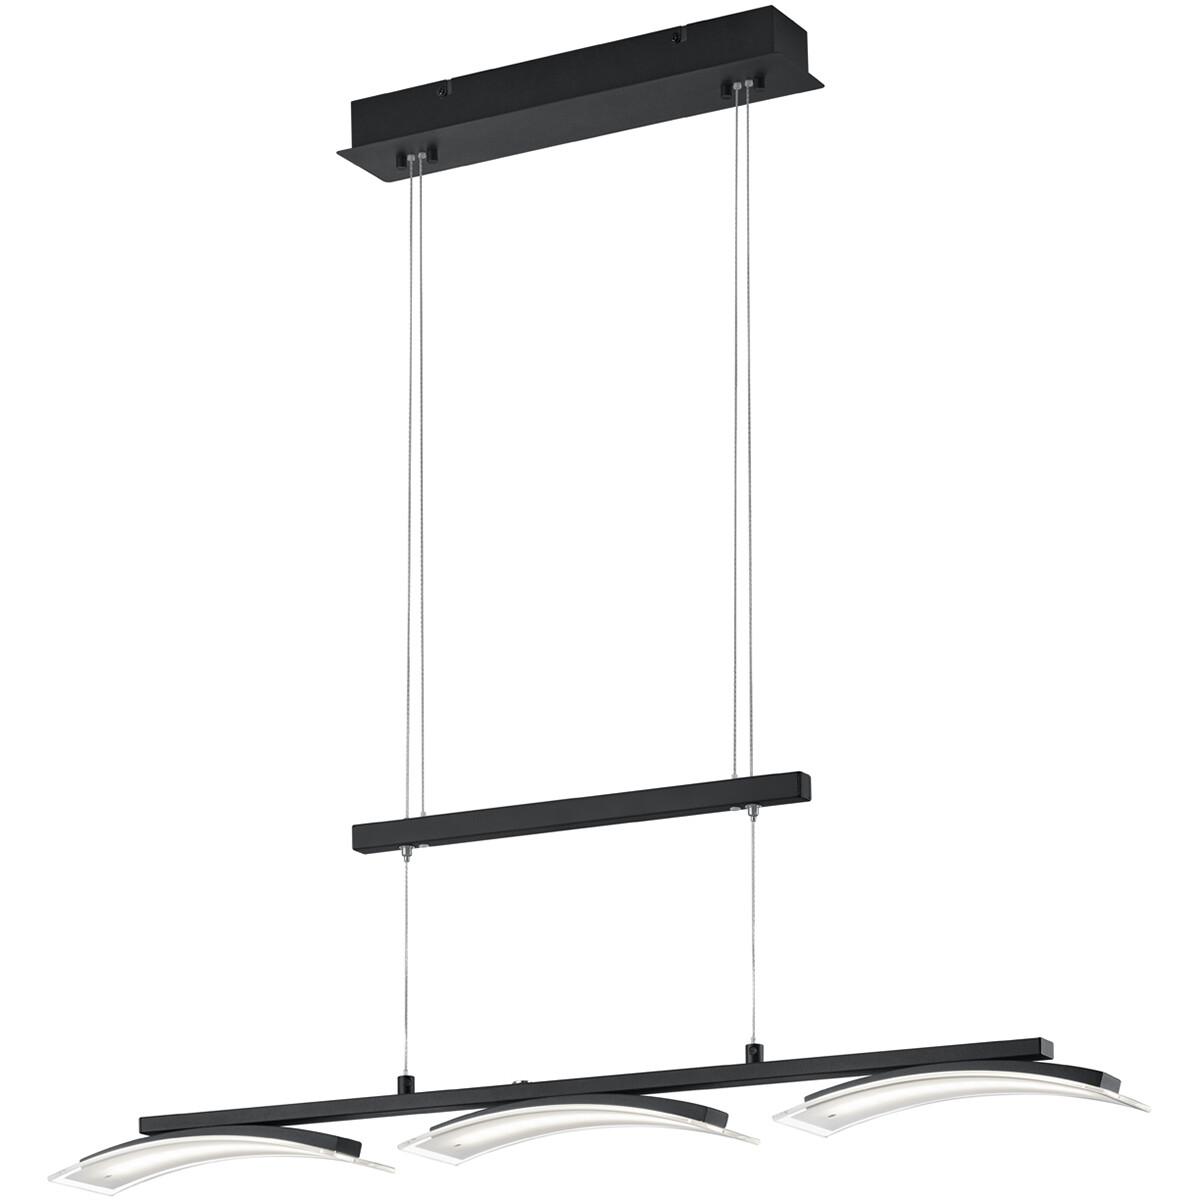 LED Hanglamp - Hangverlichting - Trion Ivar - 15W - Aanpasbare Kleur - Dimbaar - Rechthoek - Mat Zwart - Aluminium